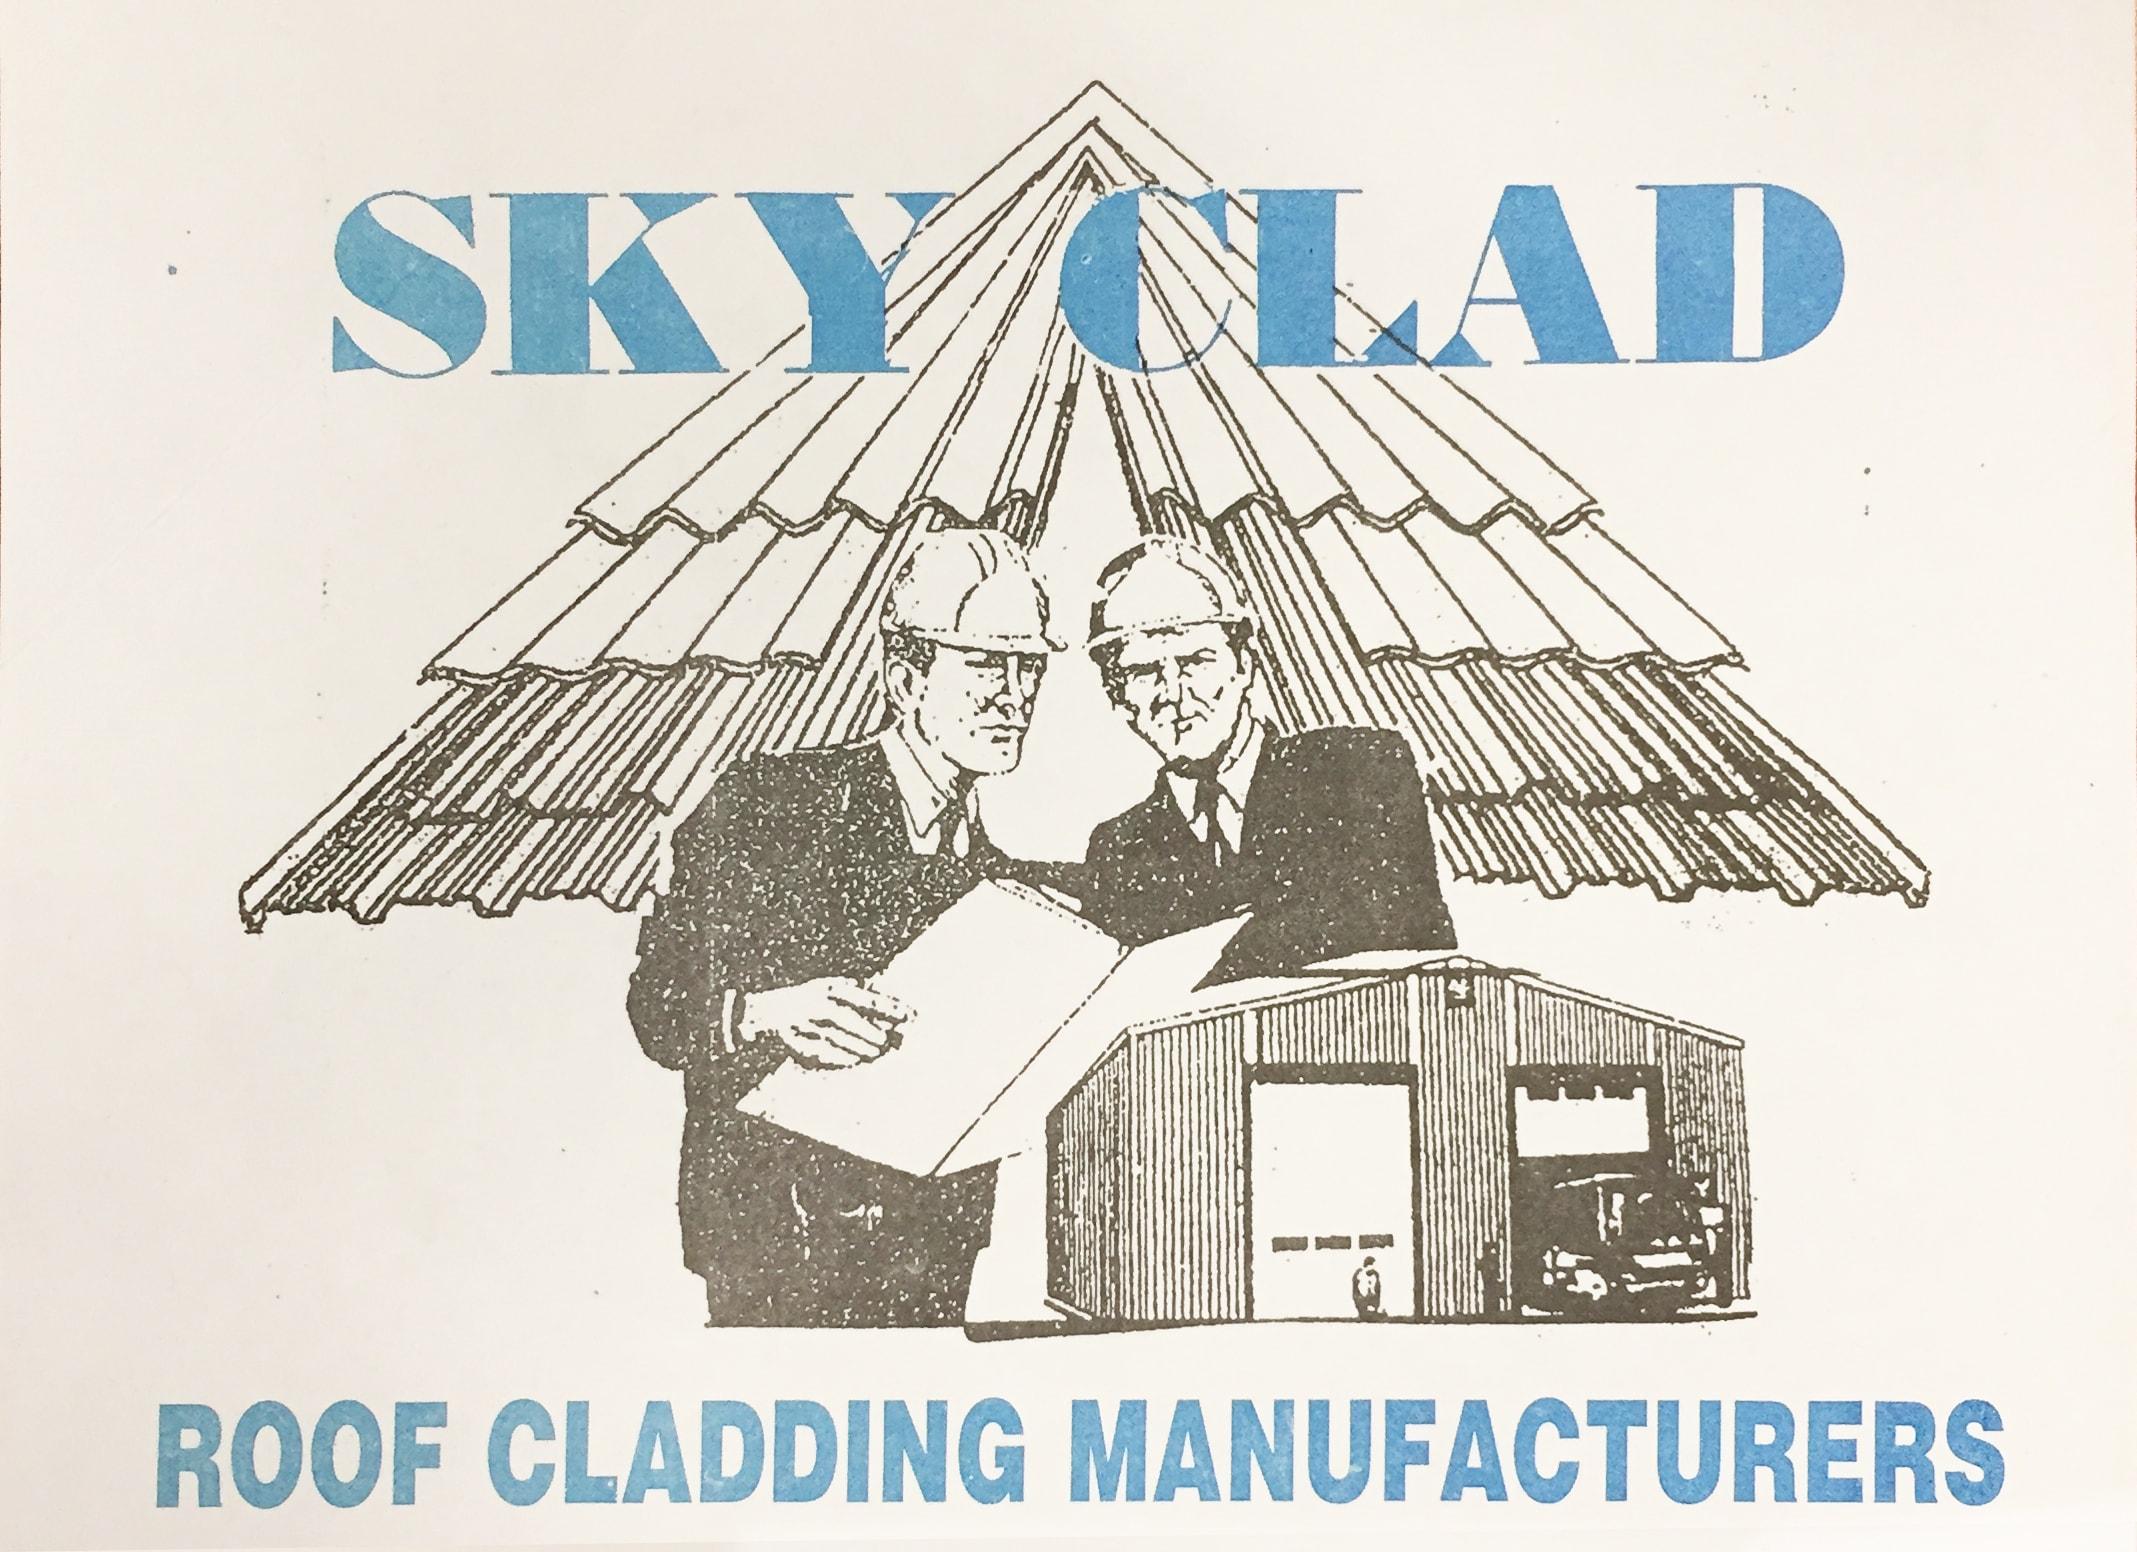 Skyclad History